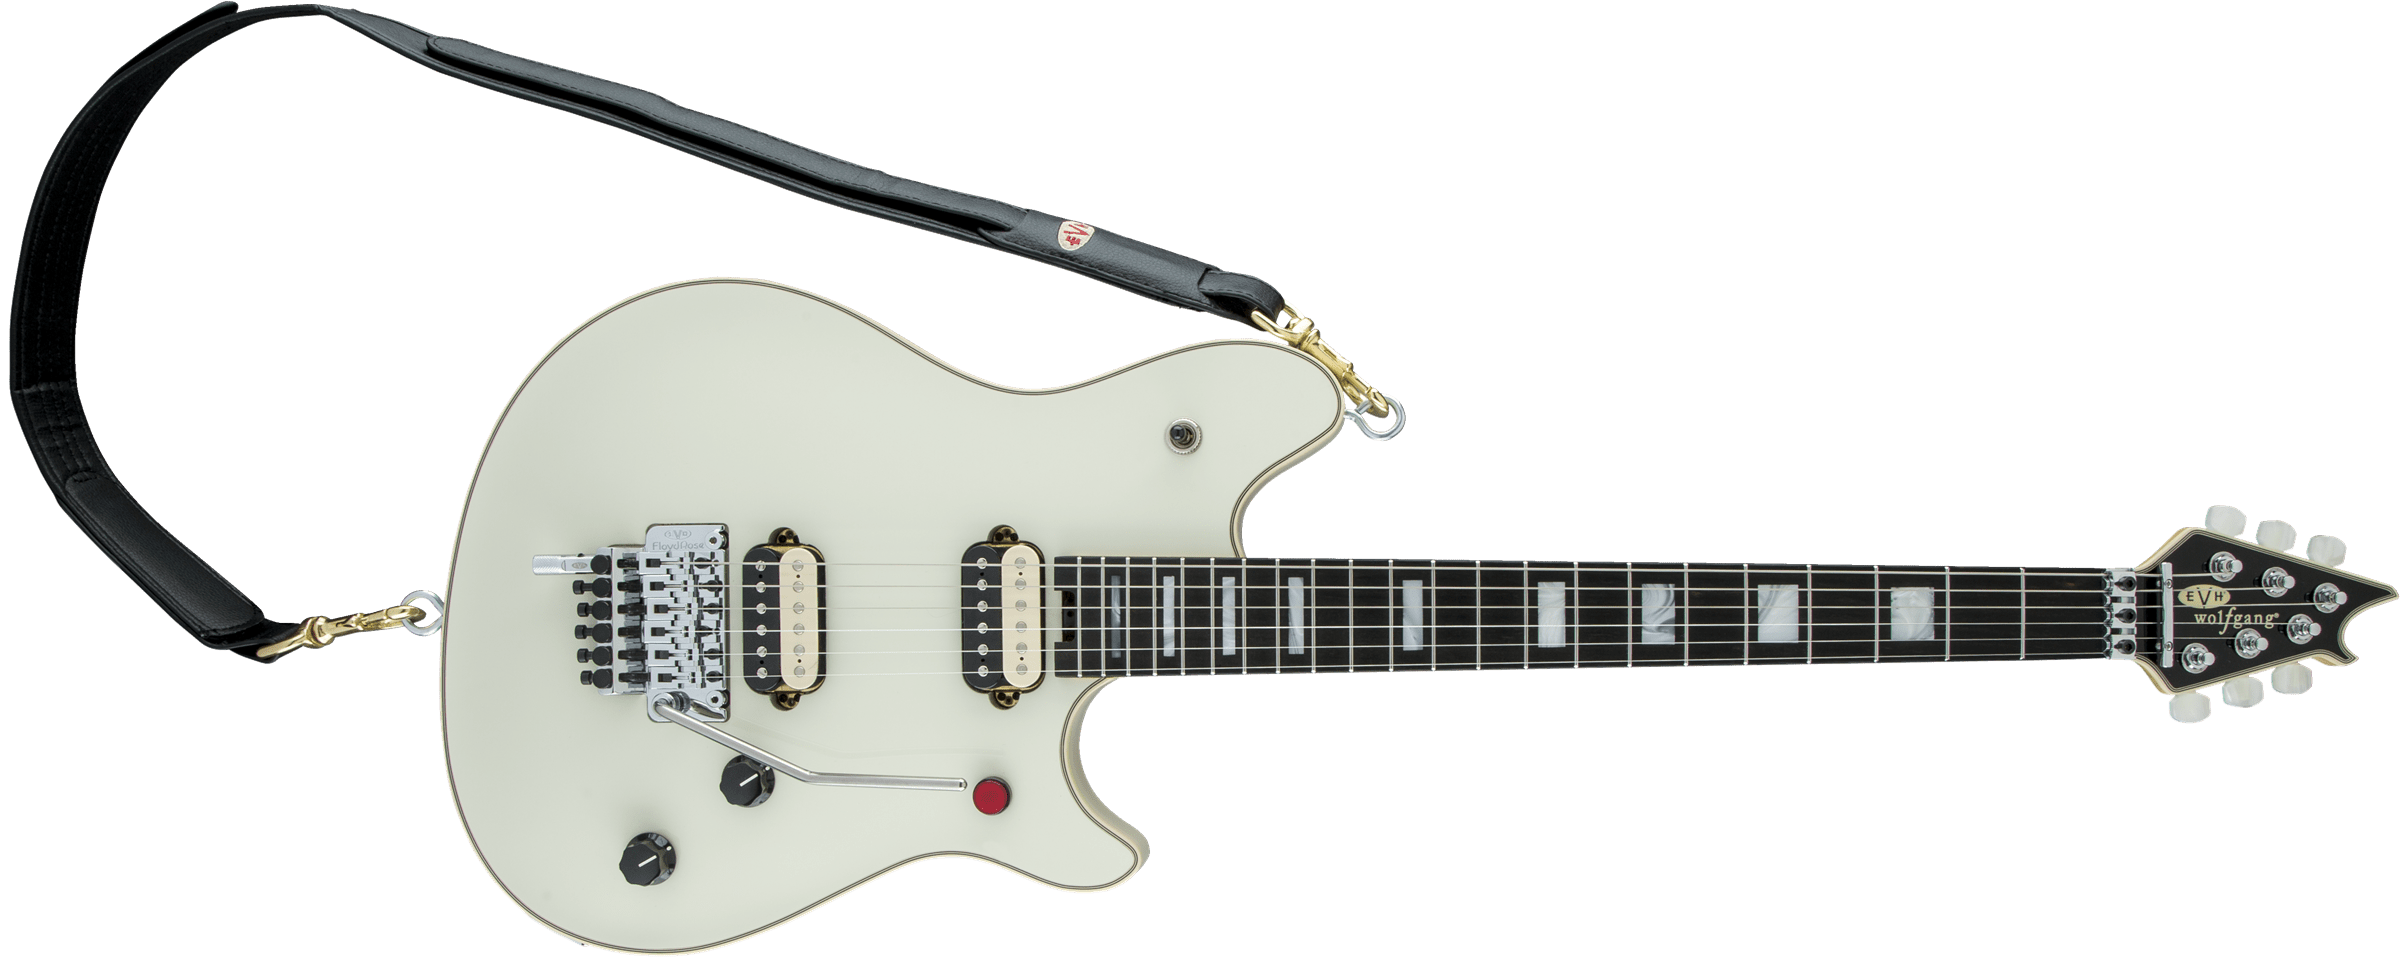 Wolfgang® USA Edward Van Halen Signature, Ebony Fingerboard, Ivory